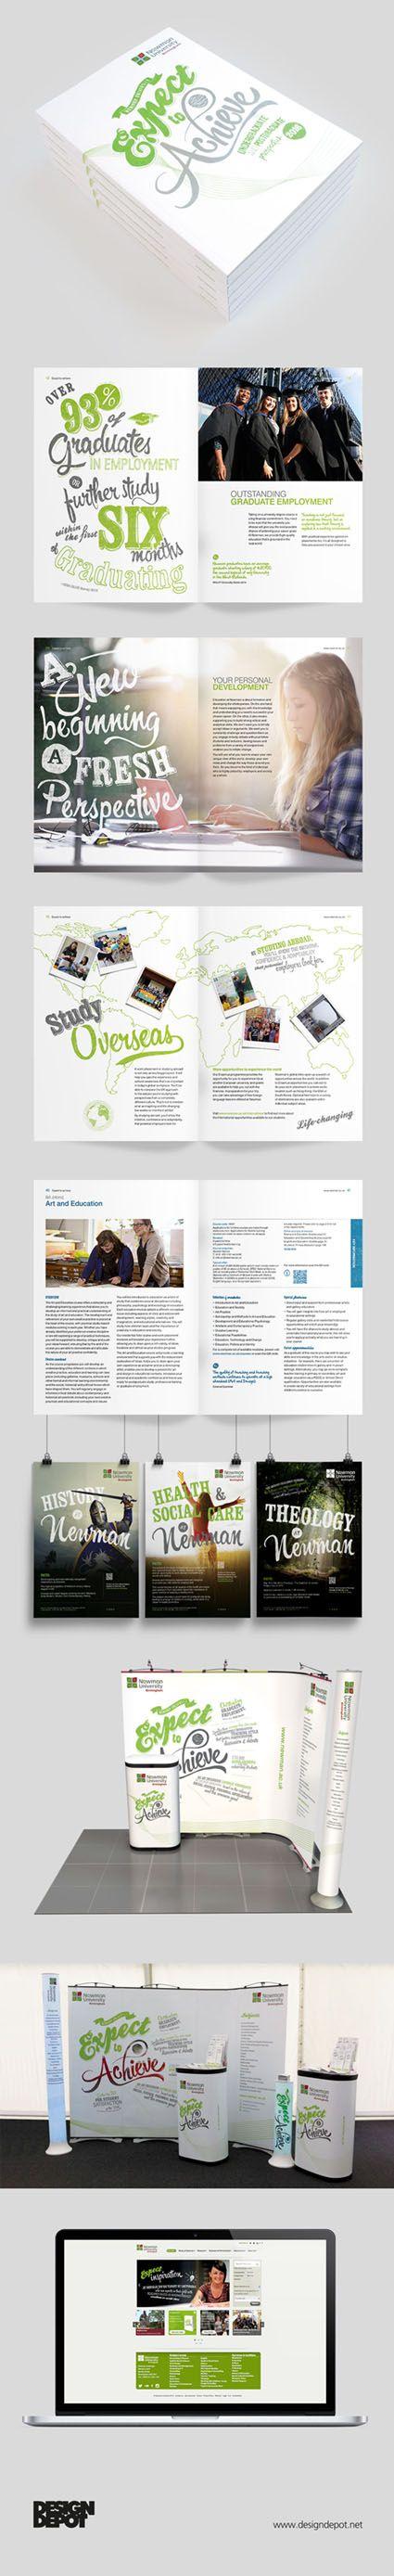 Newman University prospectus, artwork, Birmingham, university, identity, branding, design depot, prospectus, education, graphics, Northamptonshire #DesignDepot